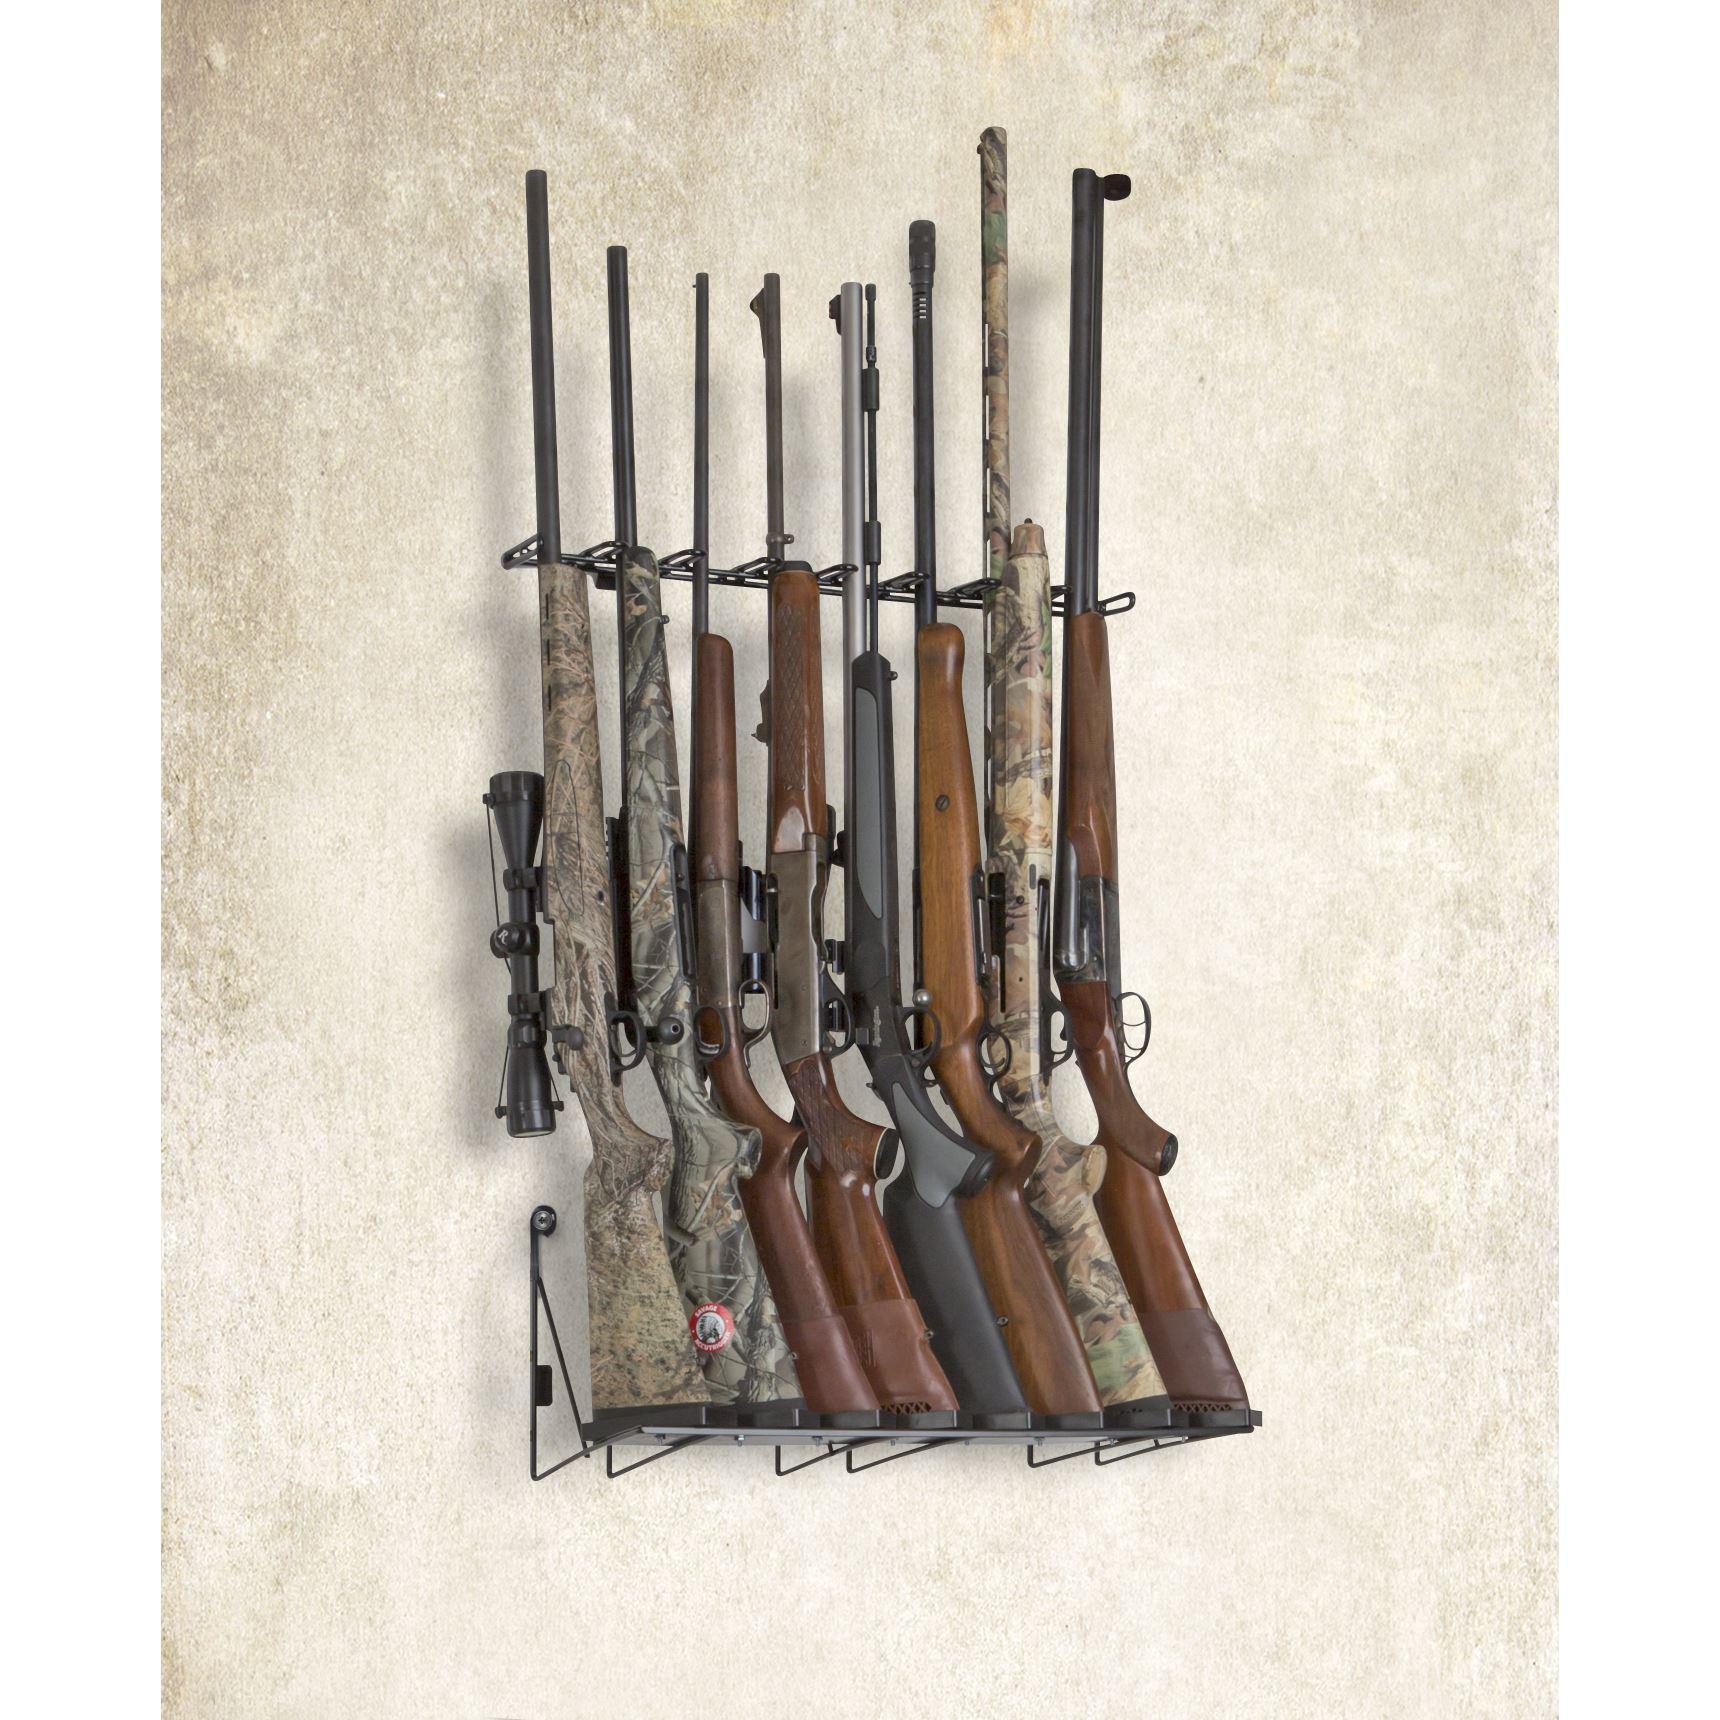 2 8 rifle wall display mount anywhere sku 6285